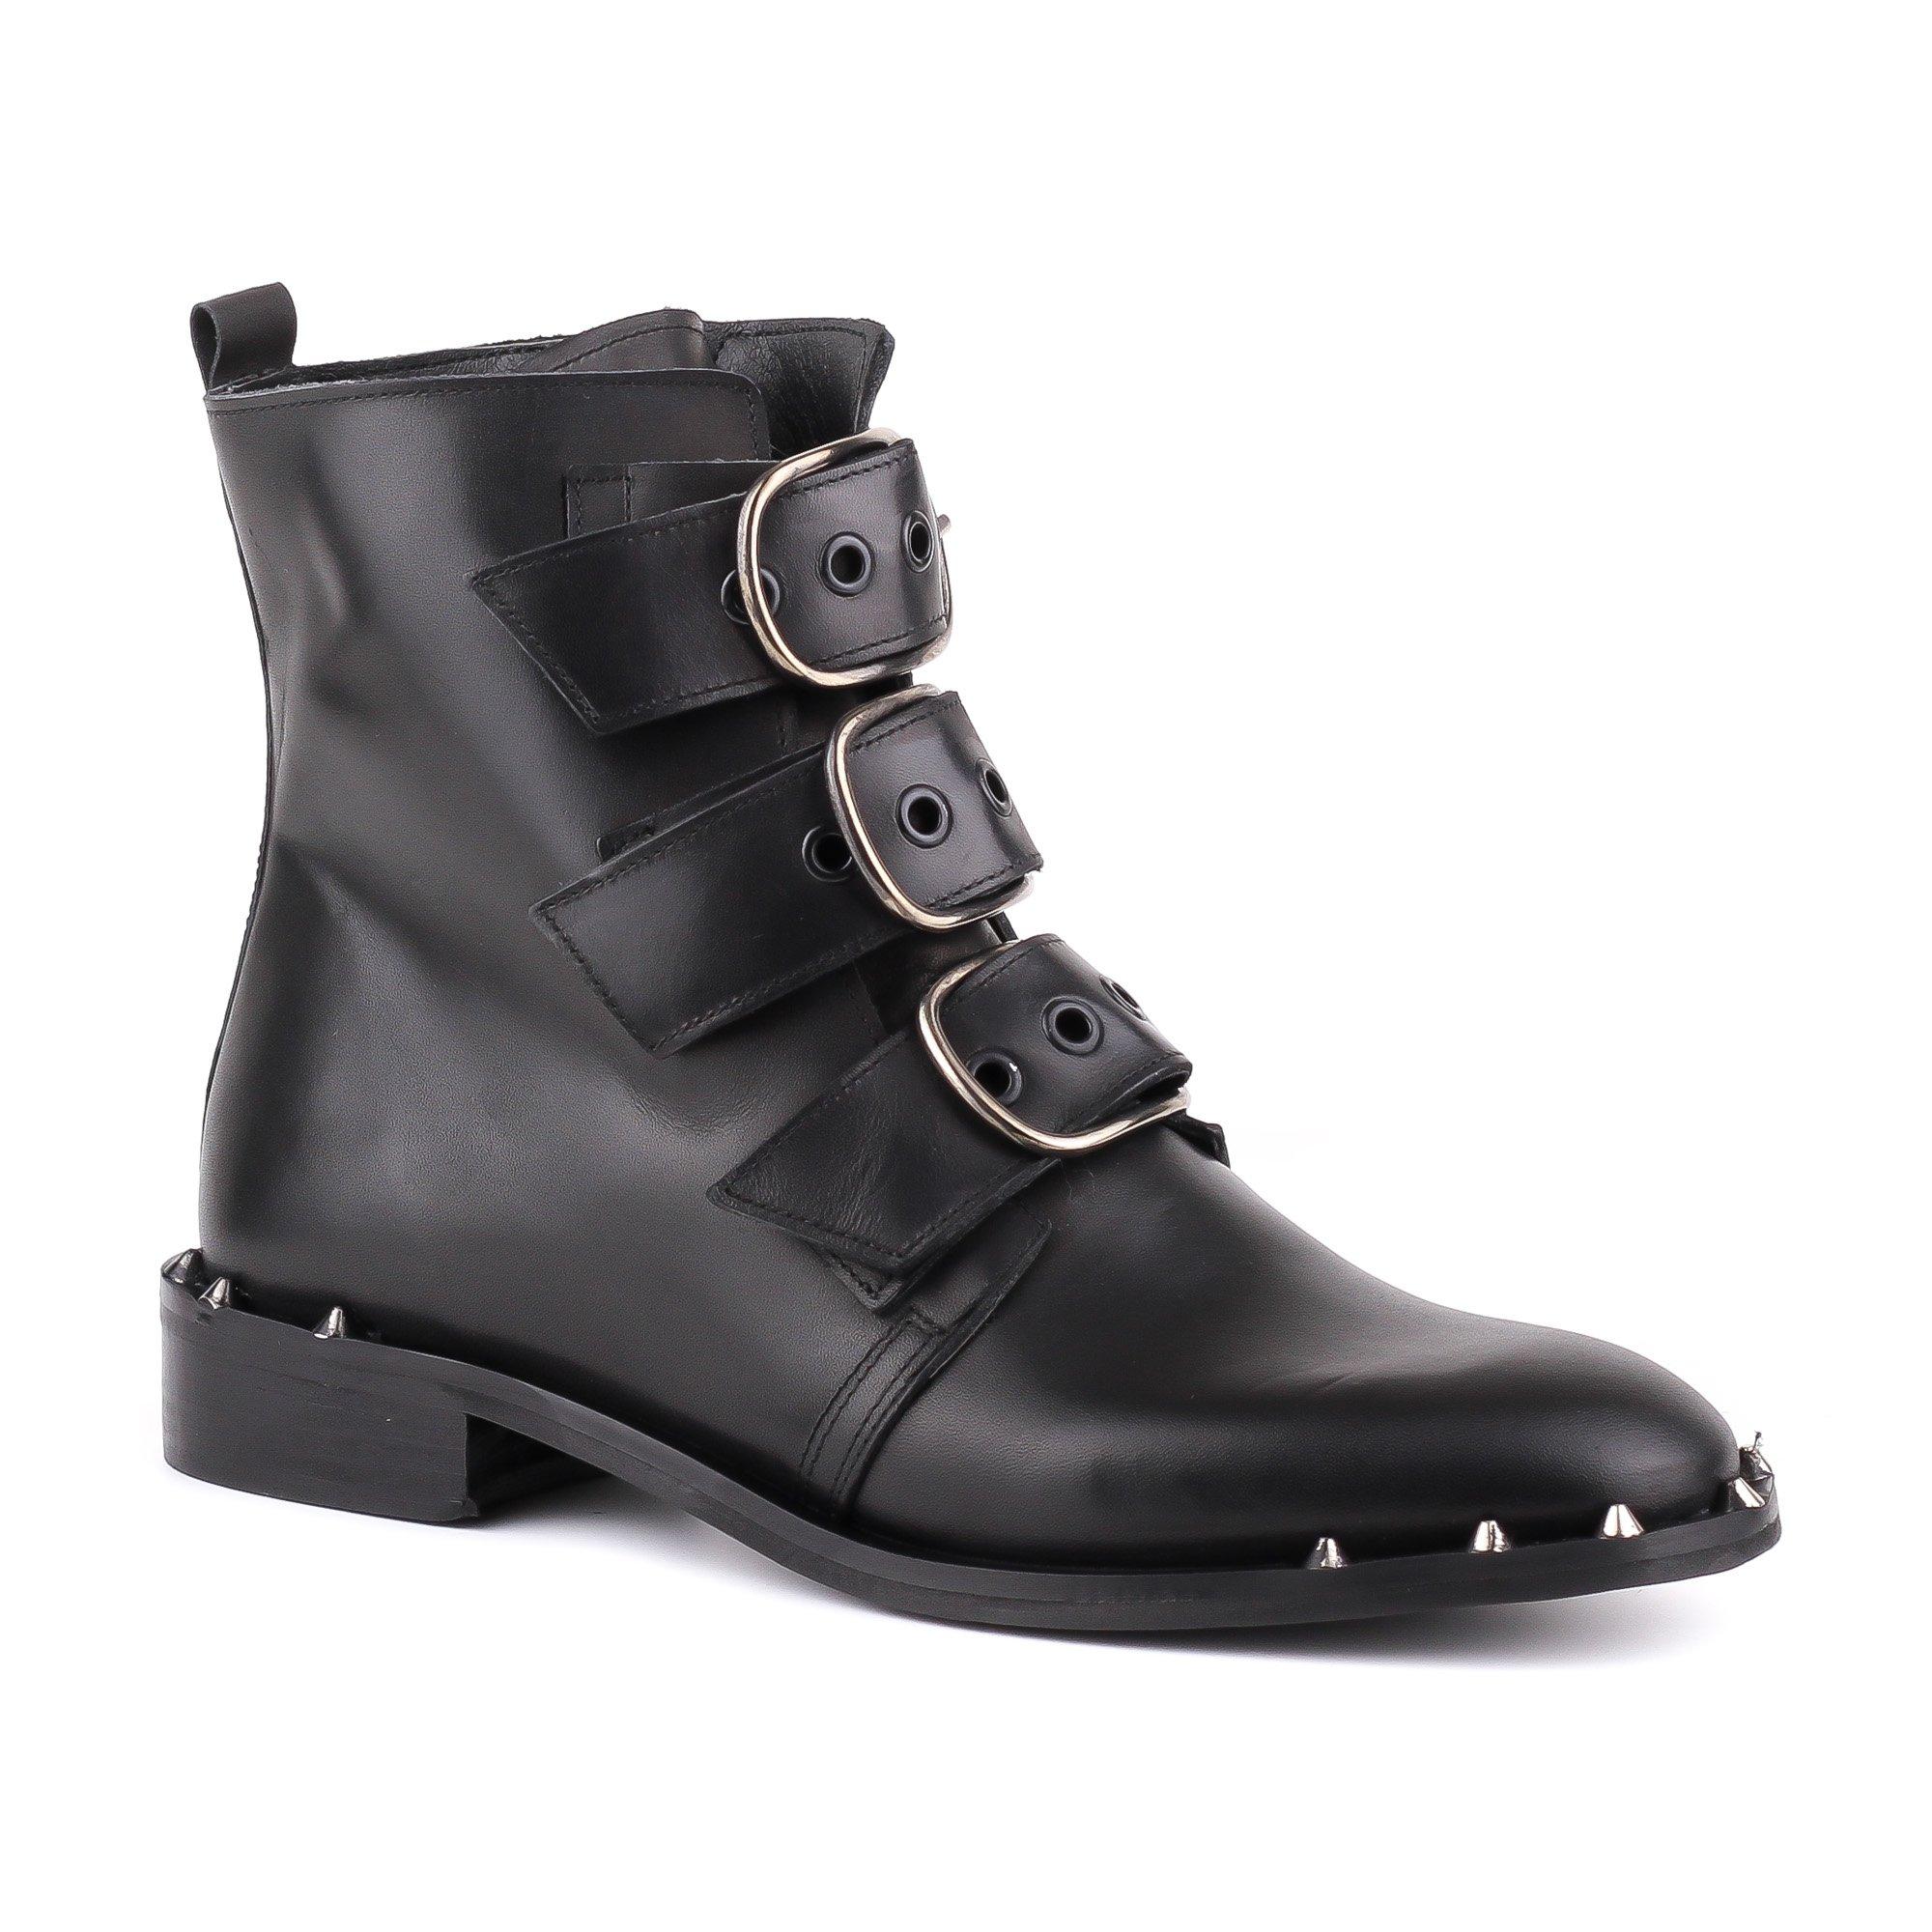 Ботинки женские Alessandro RAS10 черные 37 RU.